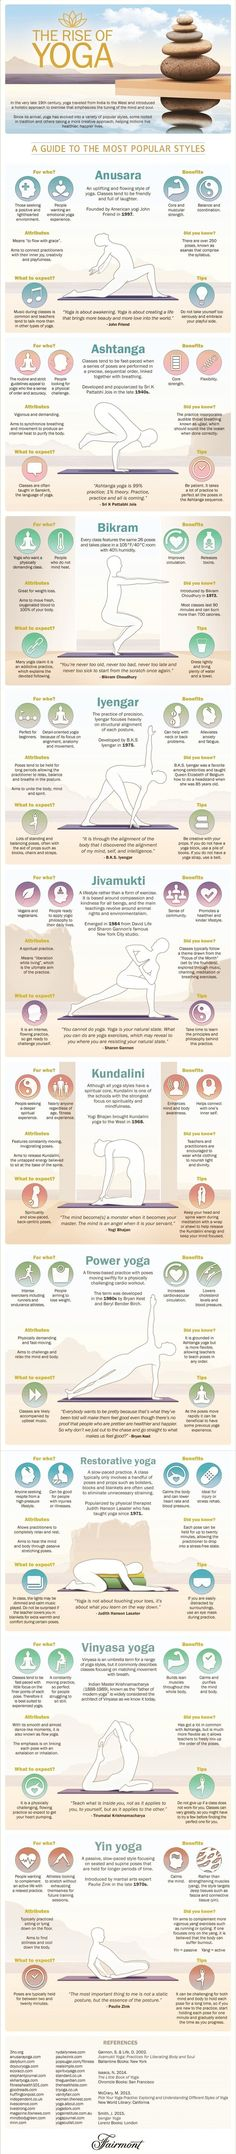 Most Popular Yoga Styles - Health Infographic. Topic: types of yoga, yogi, exercise, poses, postures, Anusara, Ashtanga, Bikram, Kripalu, Hatha, Iyengar, Kundalini, Jivamukti, Prenatal, Restorative, Sivananda, Viniyoga, Yin, Power yoga. www.pinter www.yogaweightlos... #kundaliniyogaposes